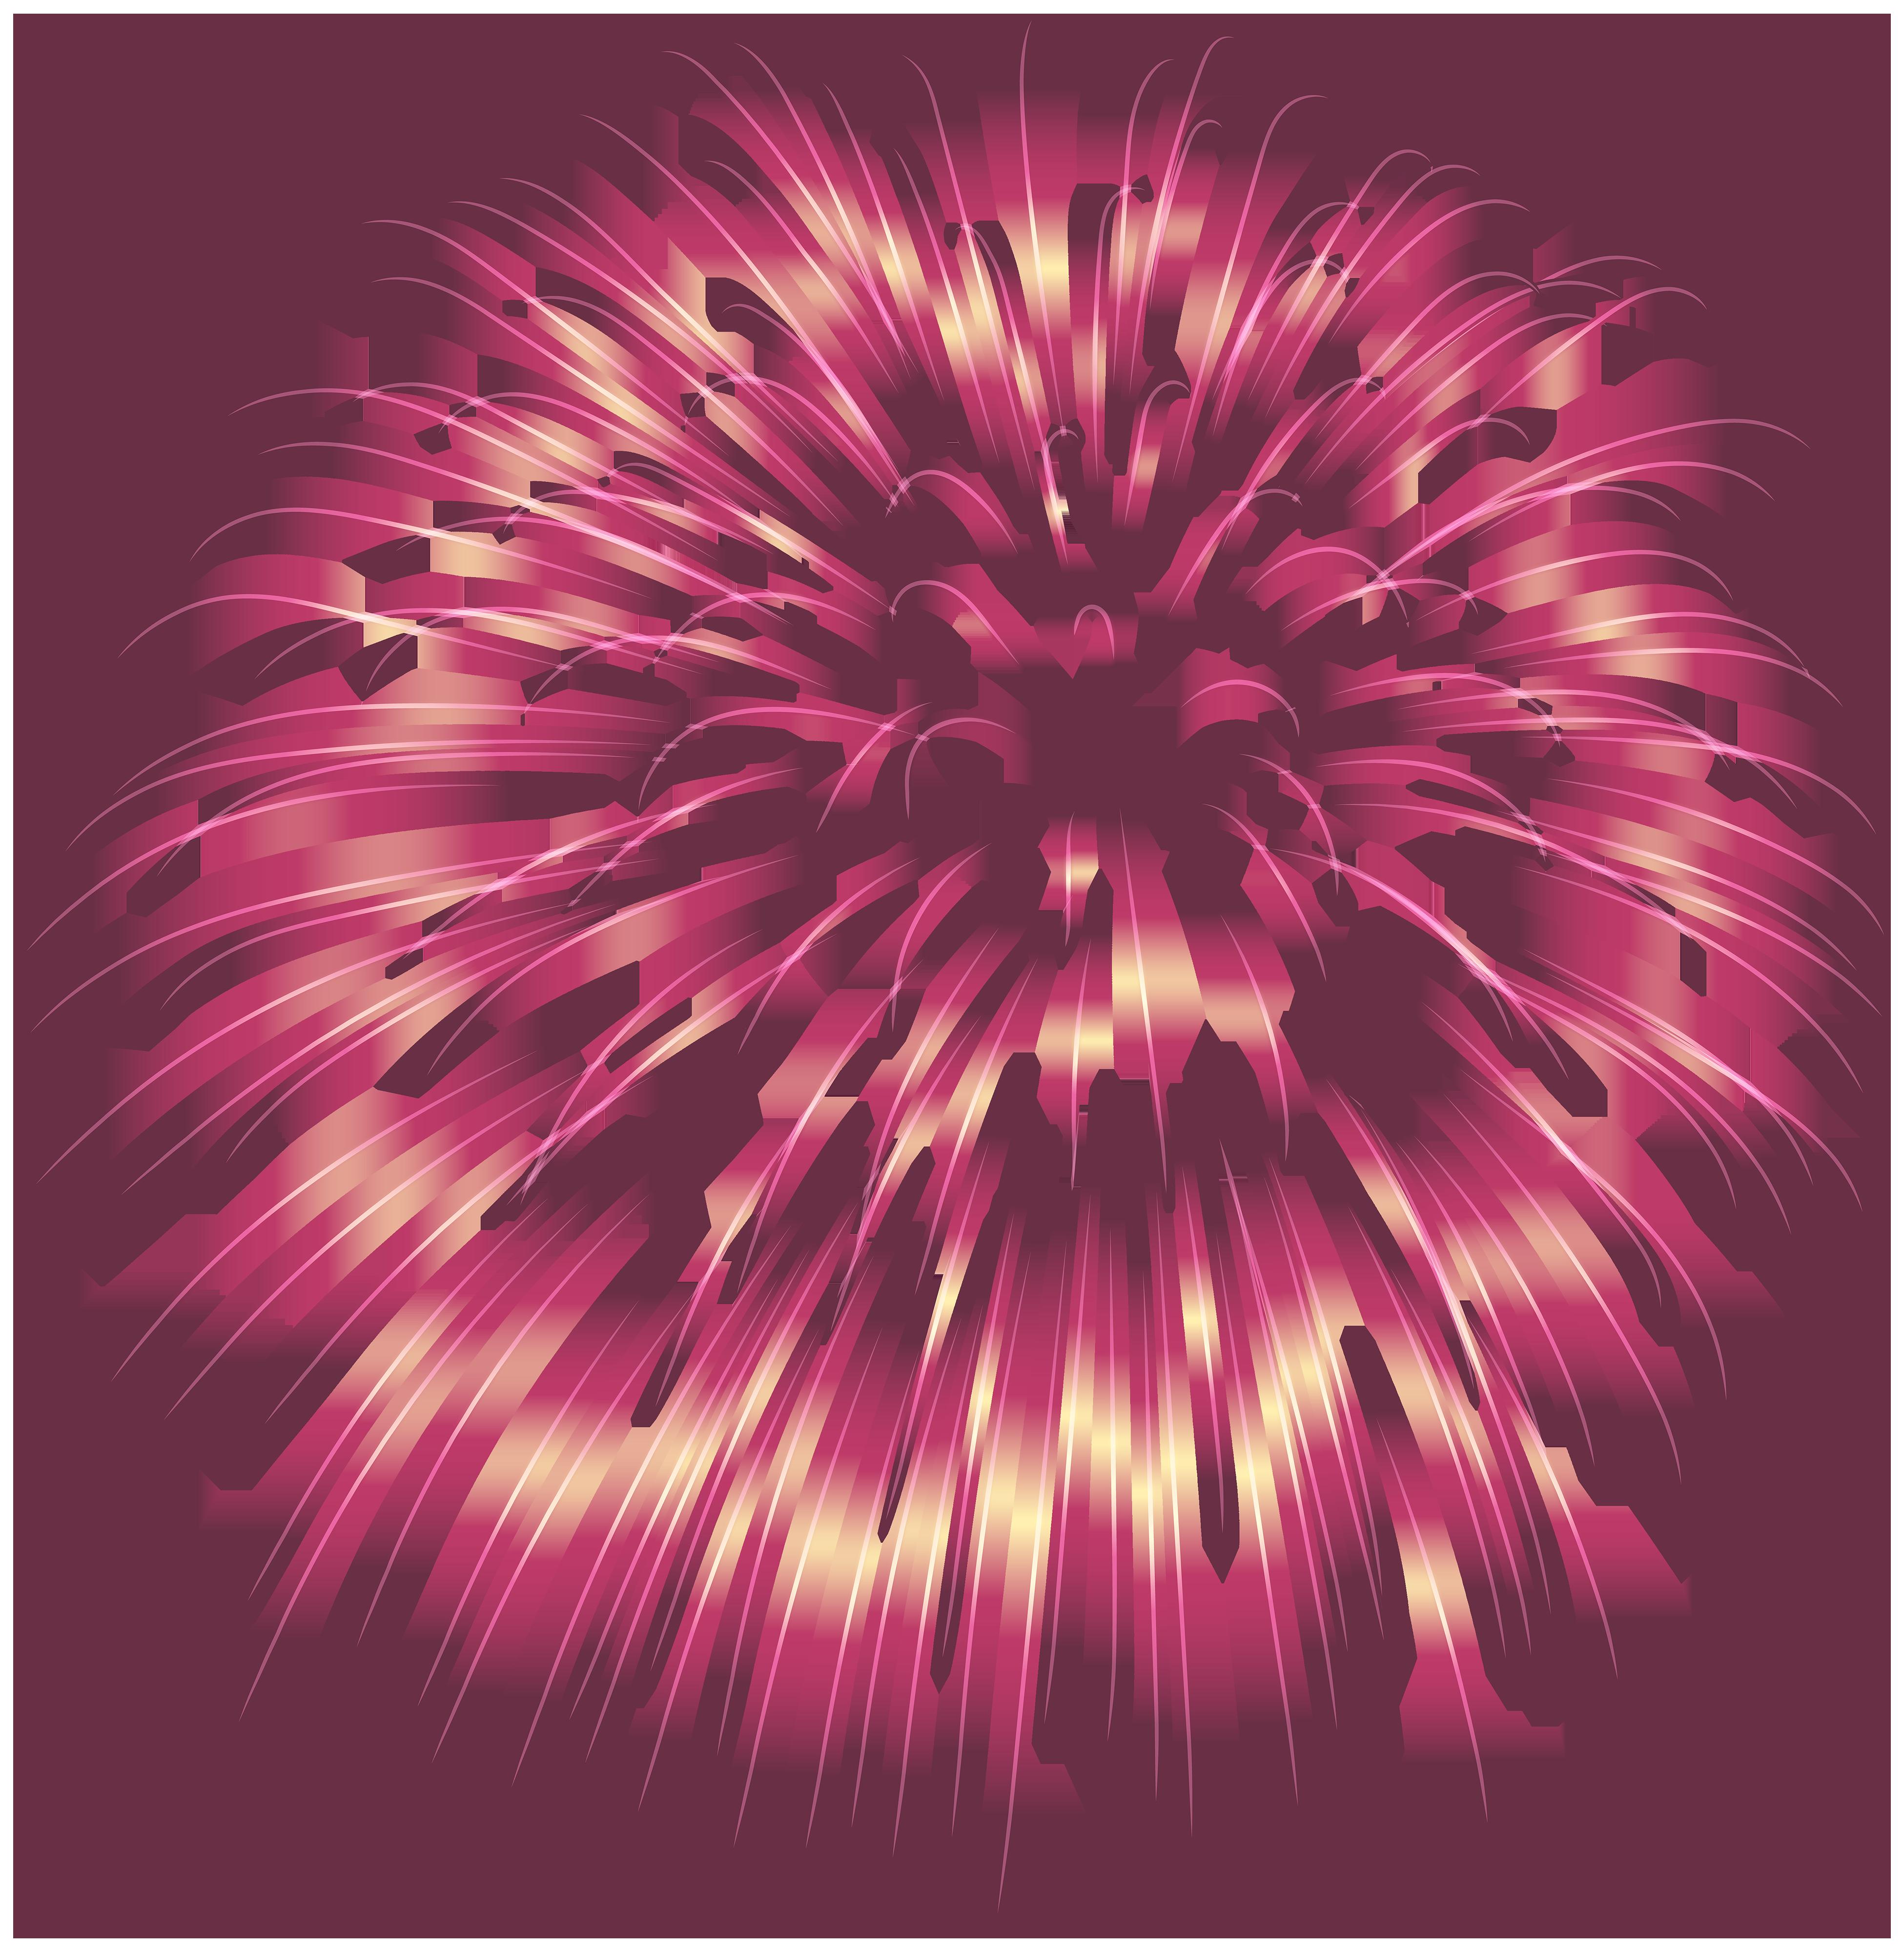 Clipart fireworks pink. Firework purple transparent png